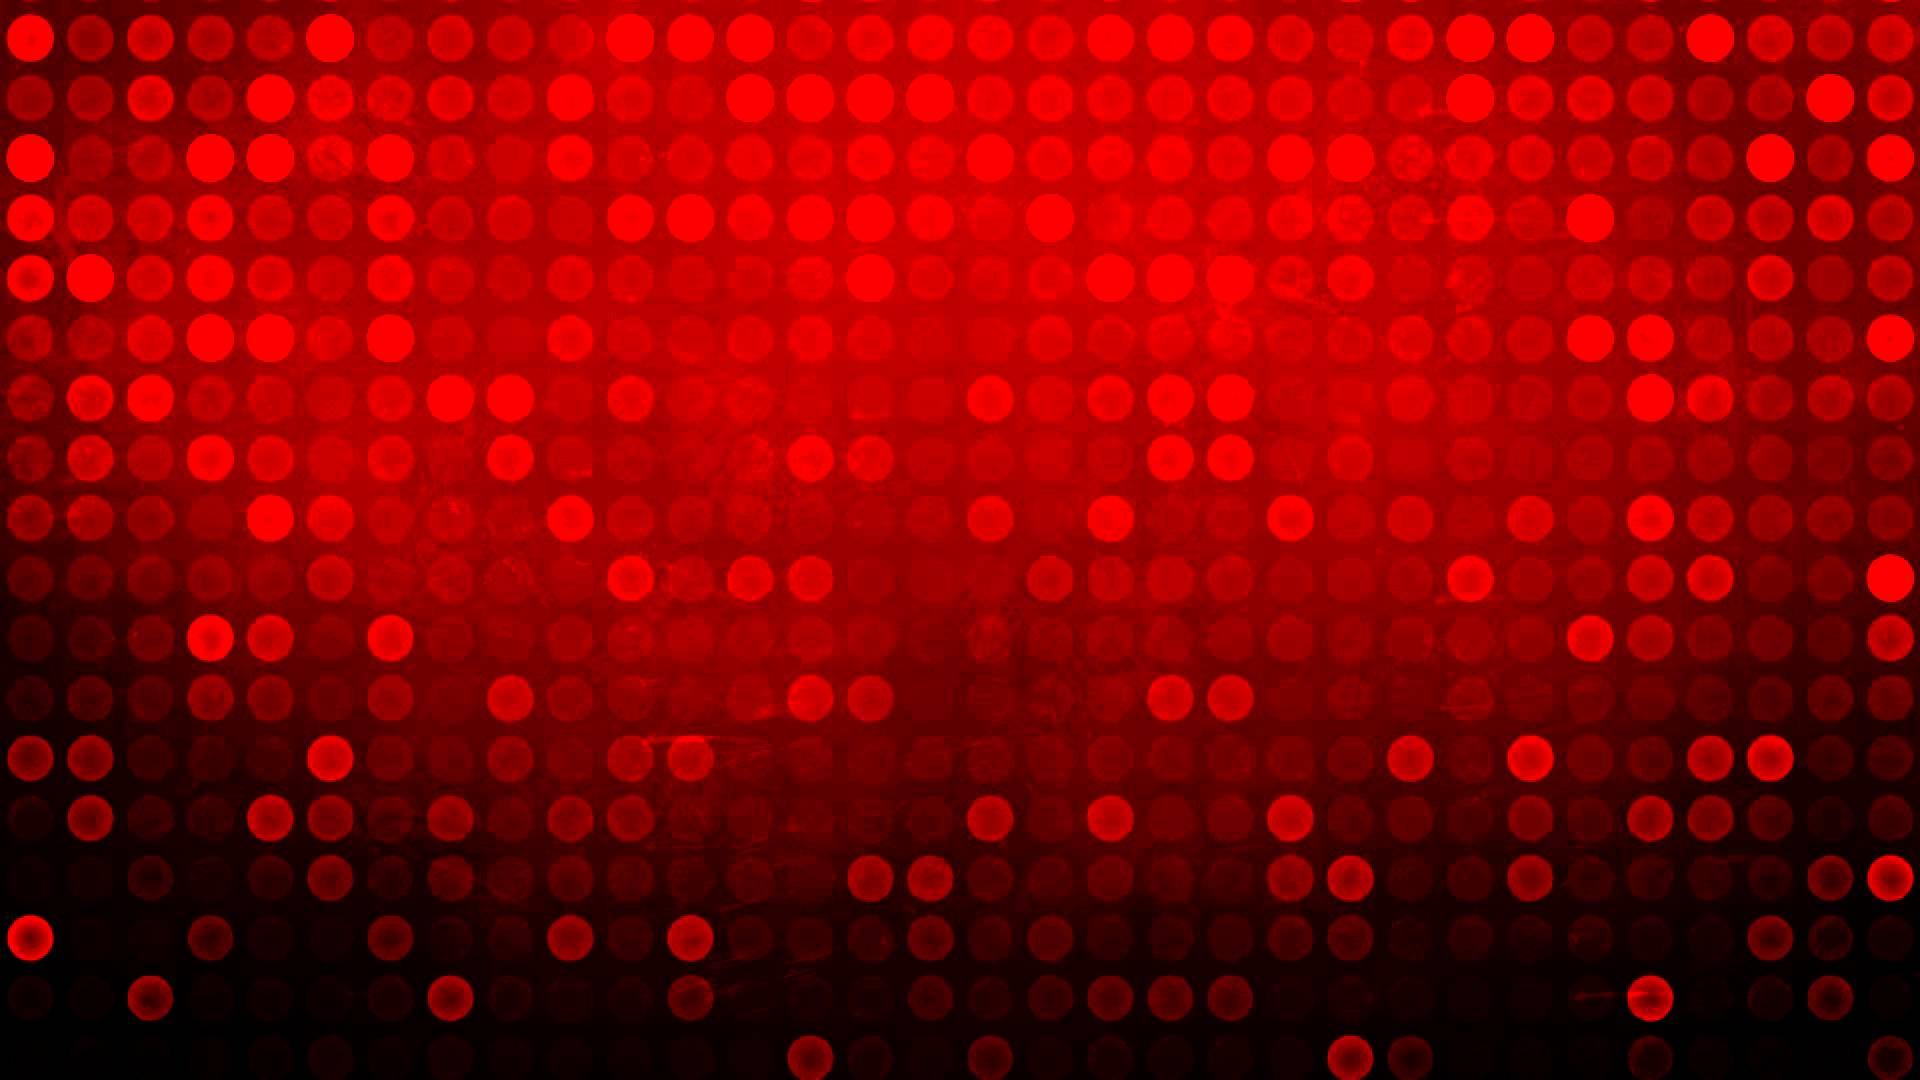 Red Wallpaper PC Desktop 6373  Cool Walldiskpapercom